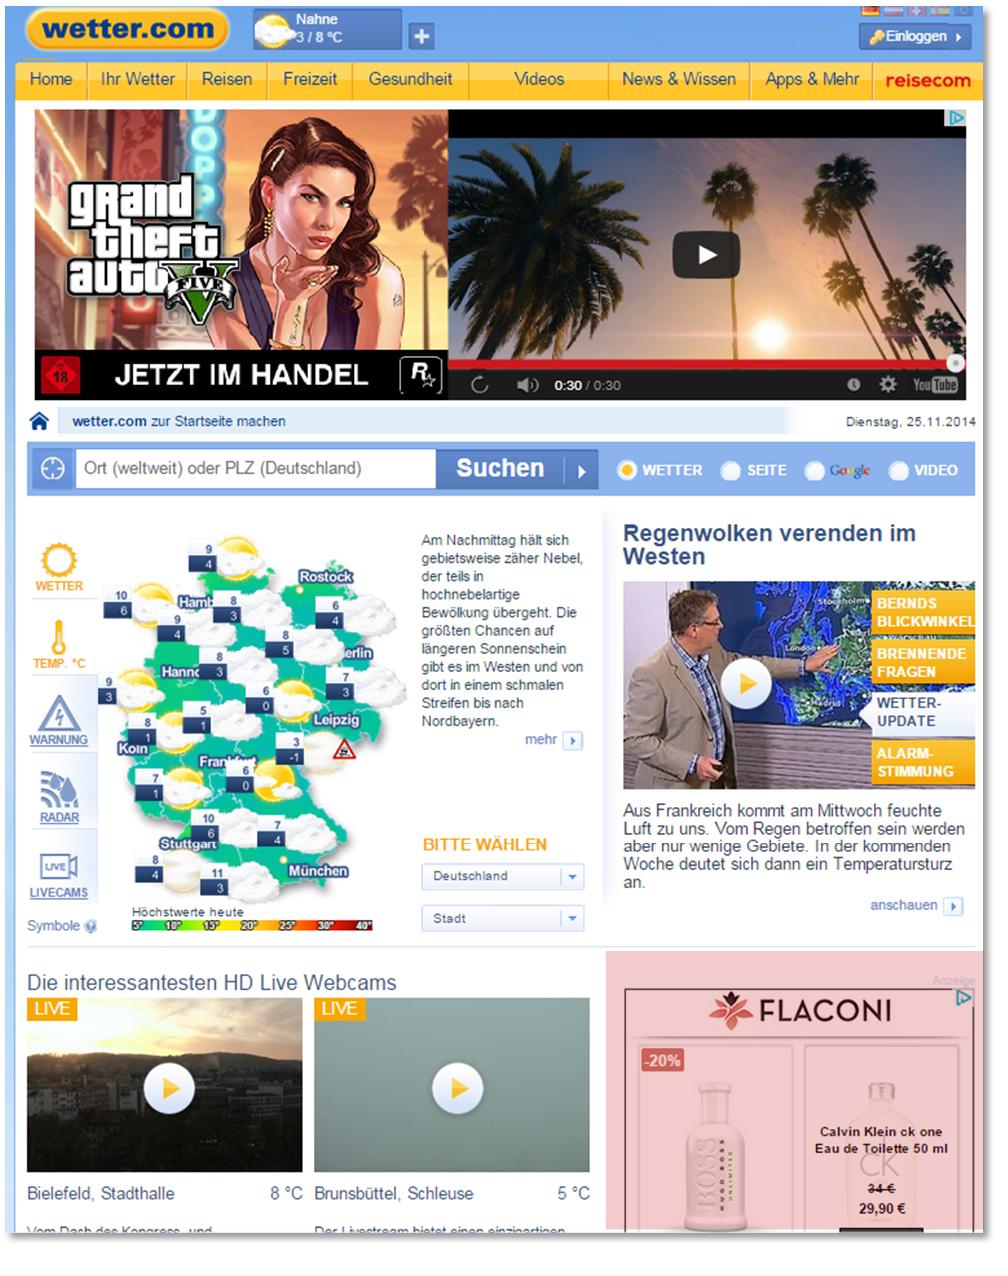 Screenshot wetter.com nach dem Besuch auf flaconi.de am 25.11.2014